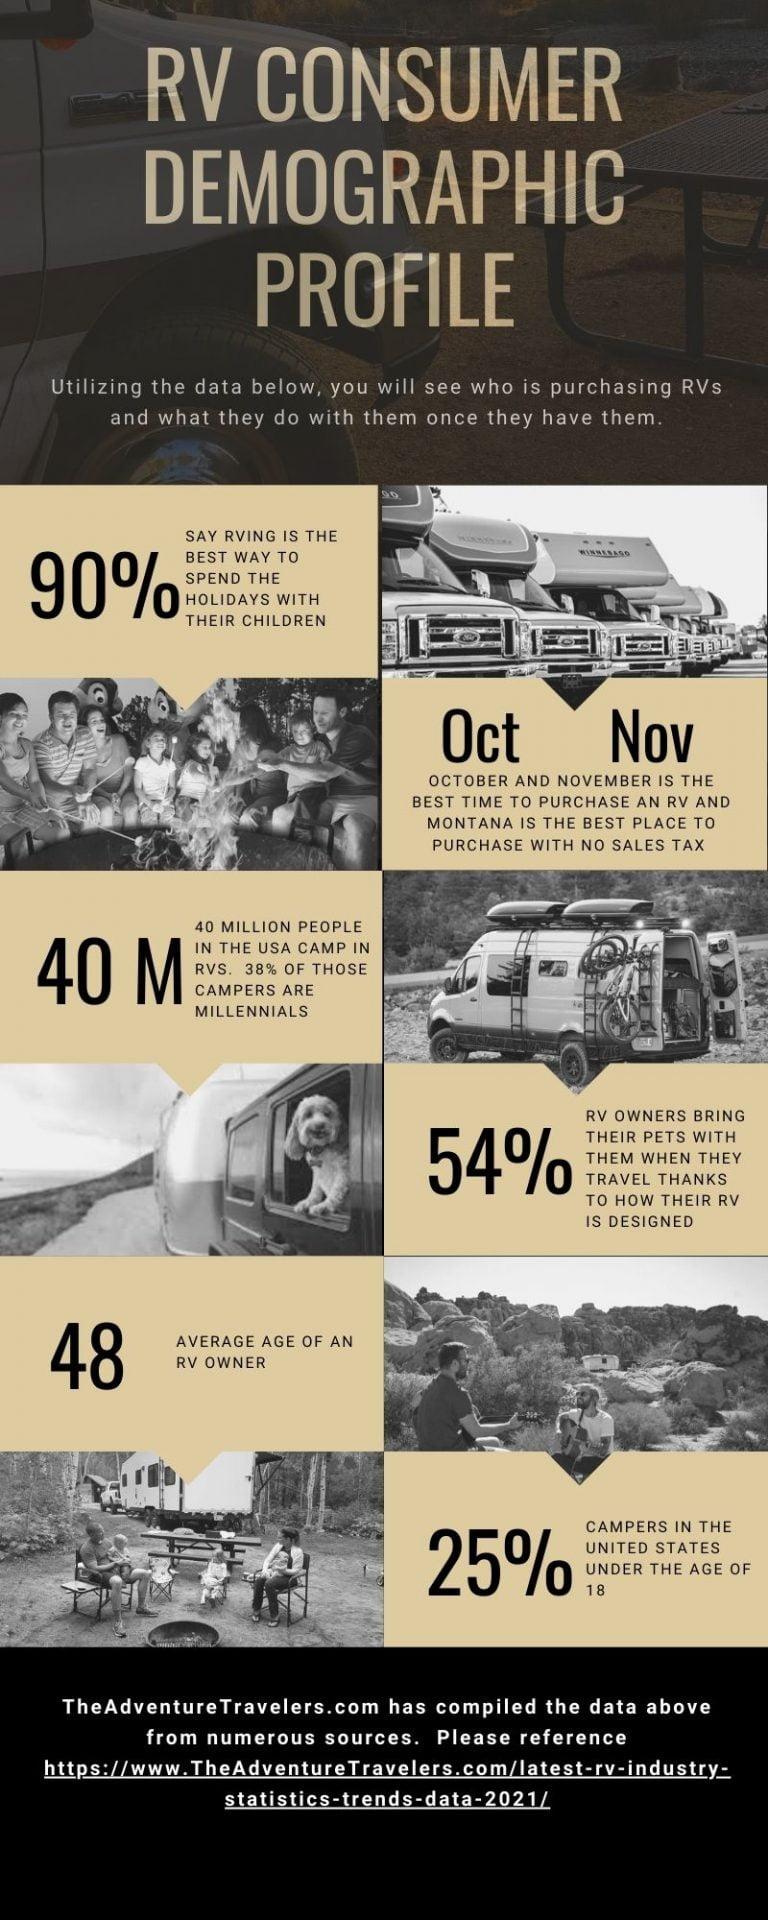 RV Consumer Demographic Profile Infographic The Adventure Travelers